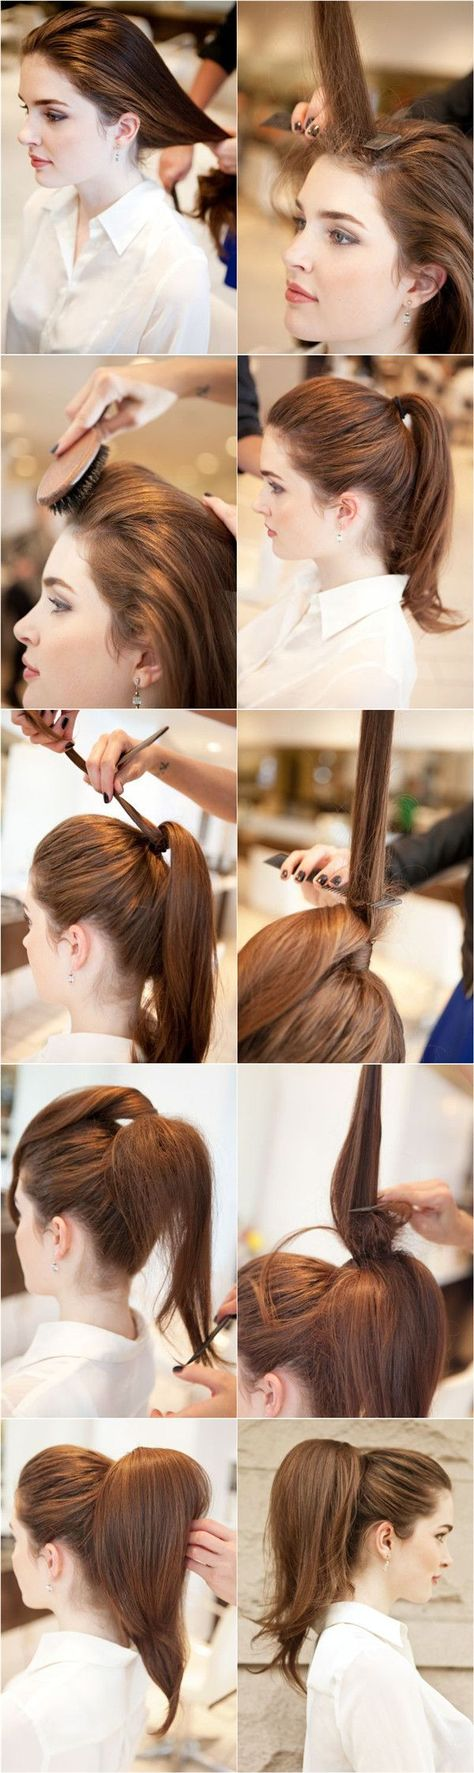 Frisuren Tipps: wie kann man einen Pferdeschwanz dichter